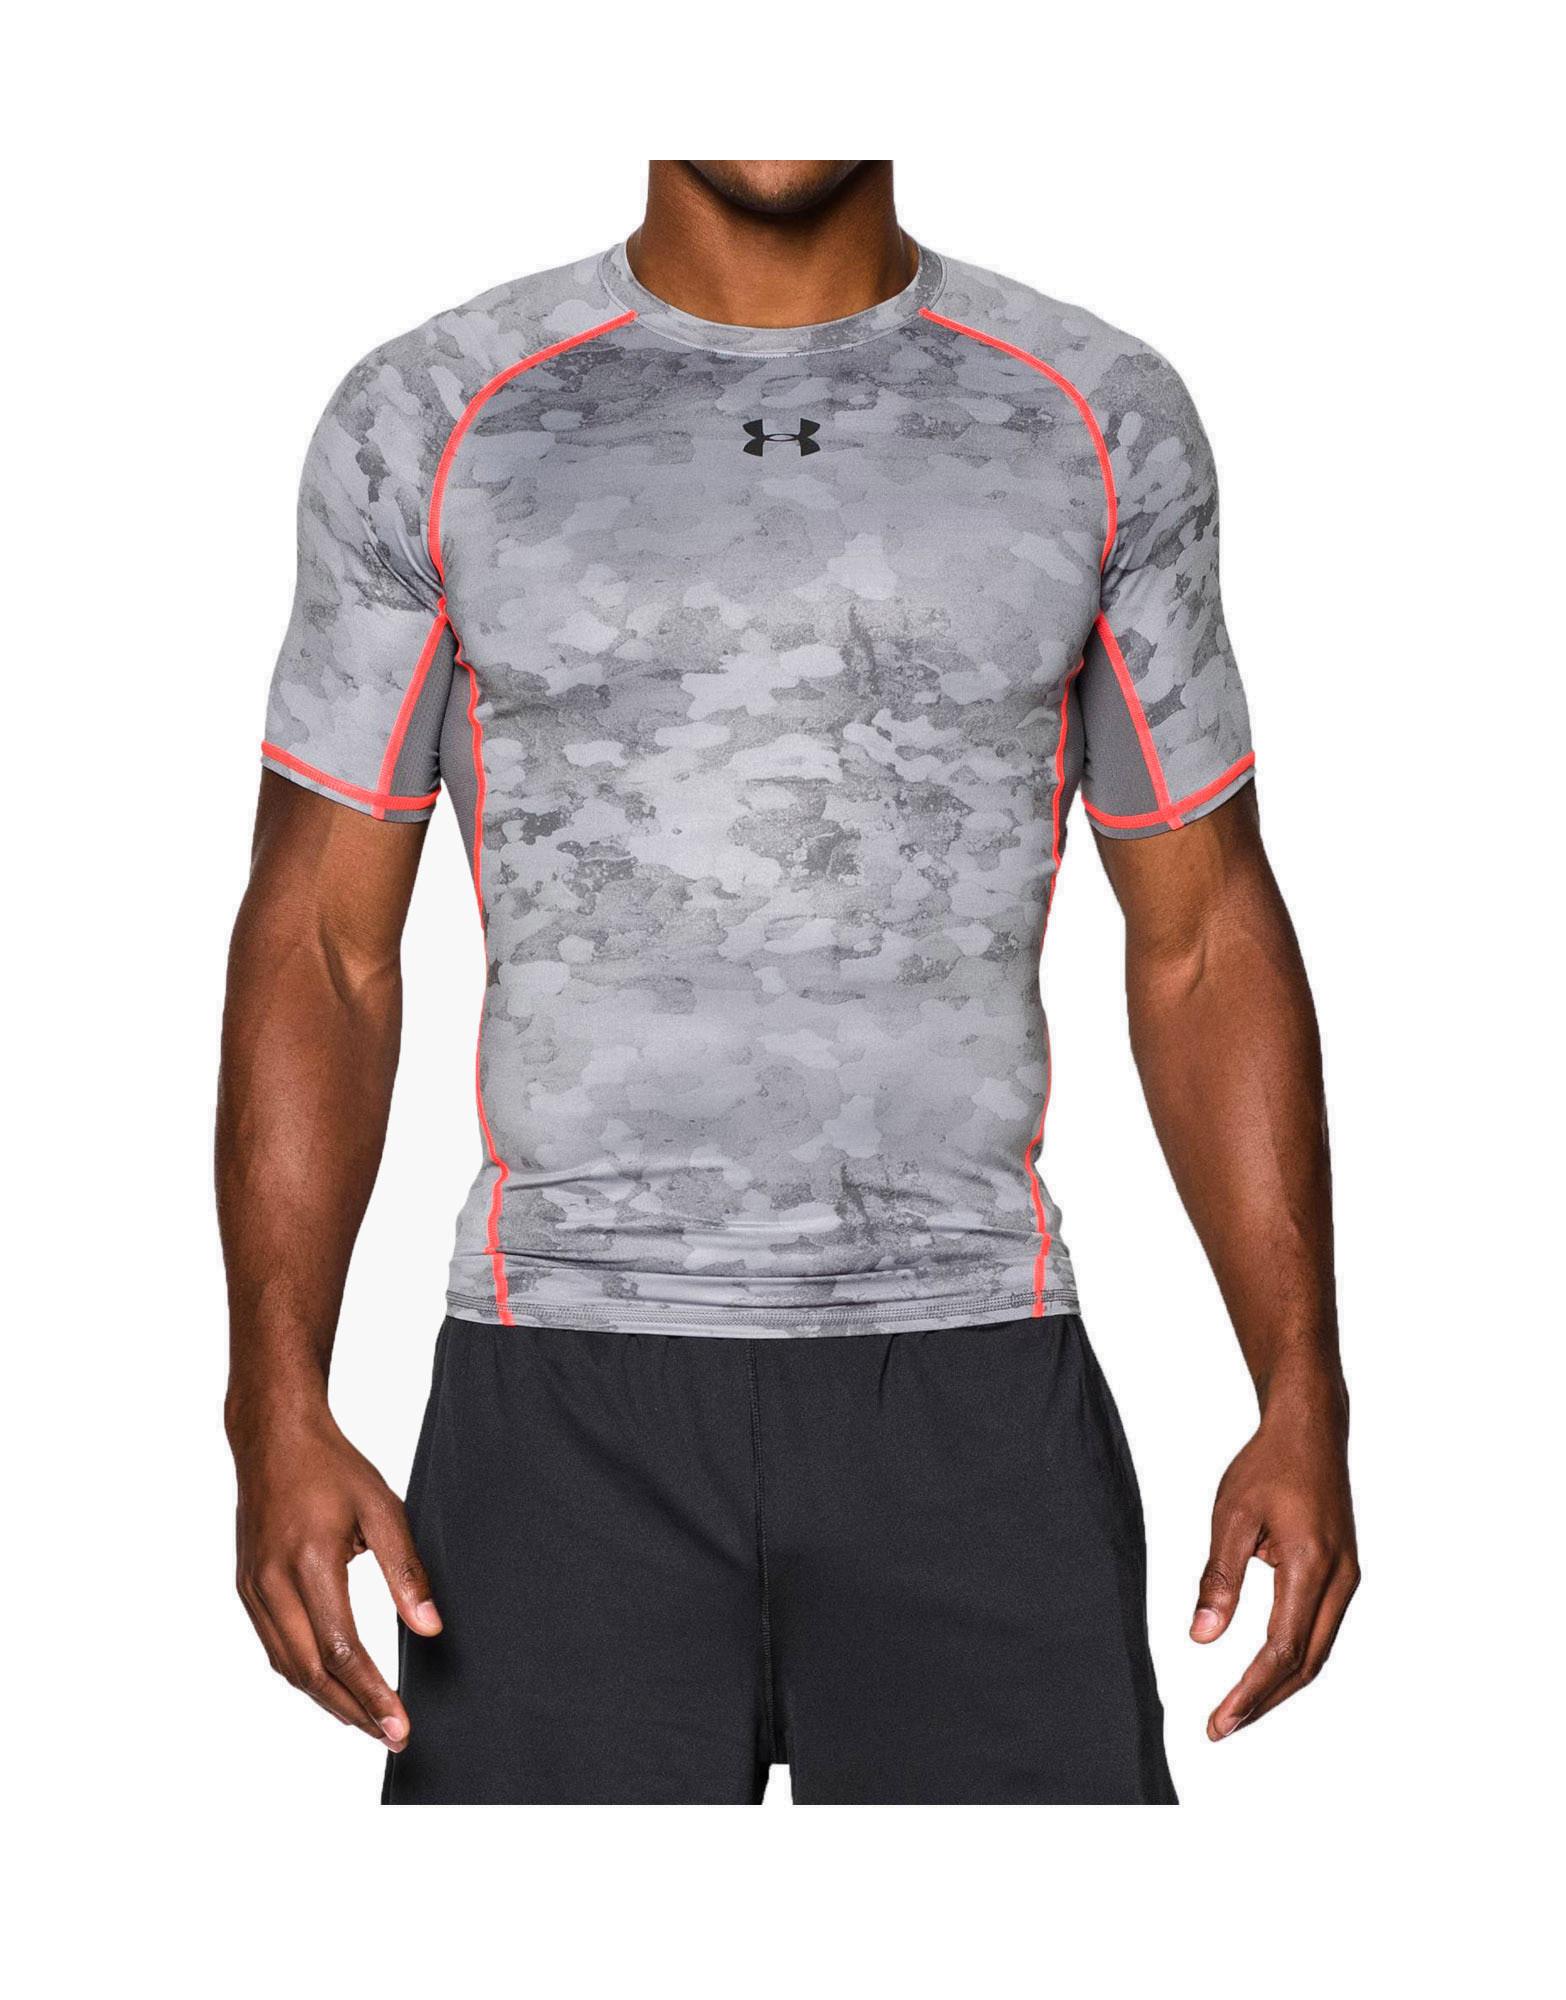 4bfa1fbf3450b Men s UA HeatGear Armour Printed Short Sleeve Compression Shirt Colour   Graphite   Bolt Orange